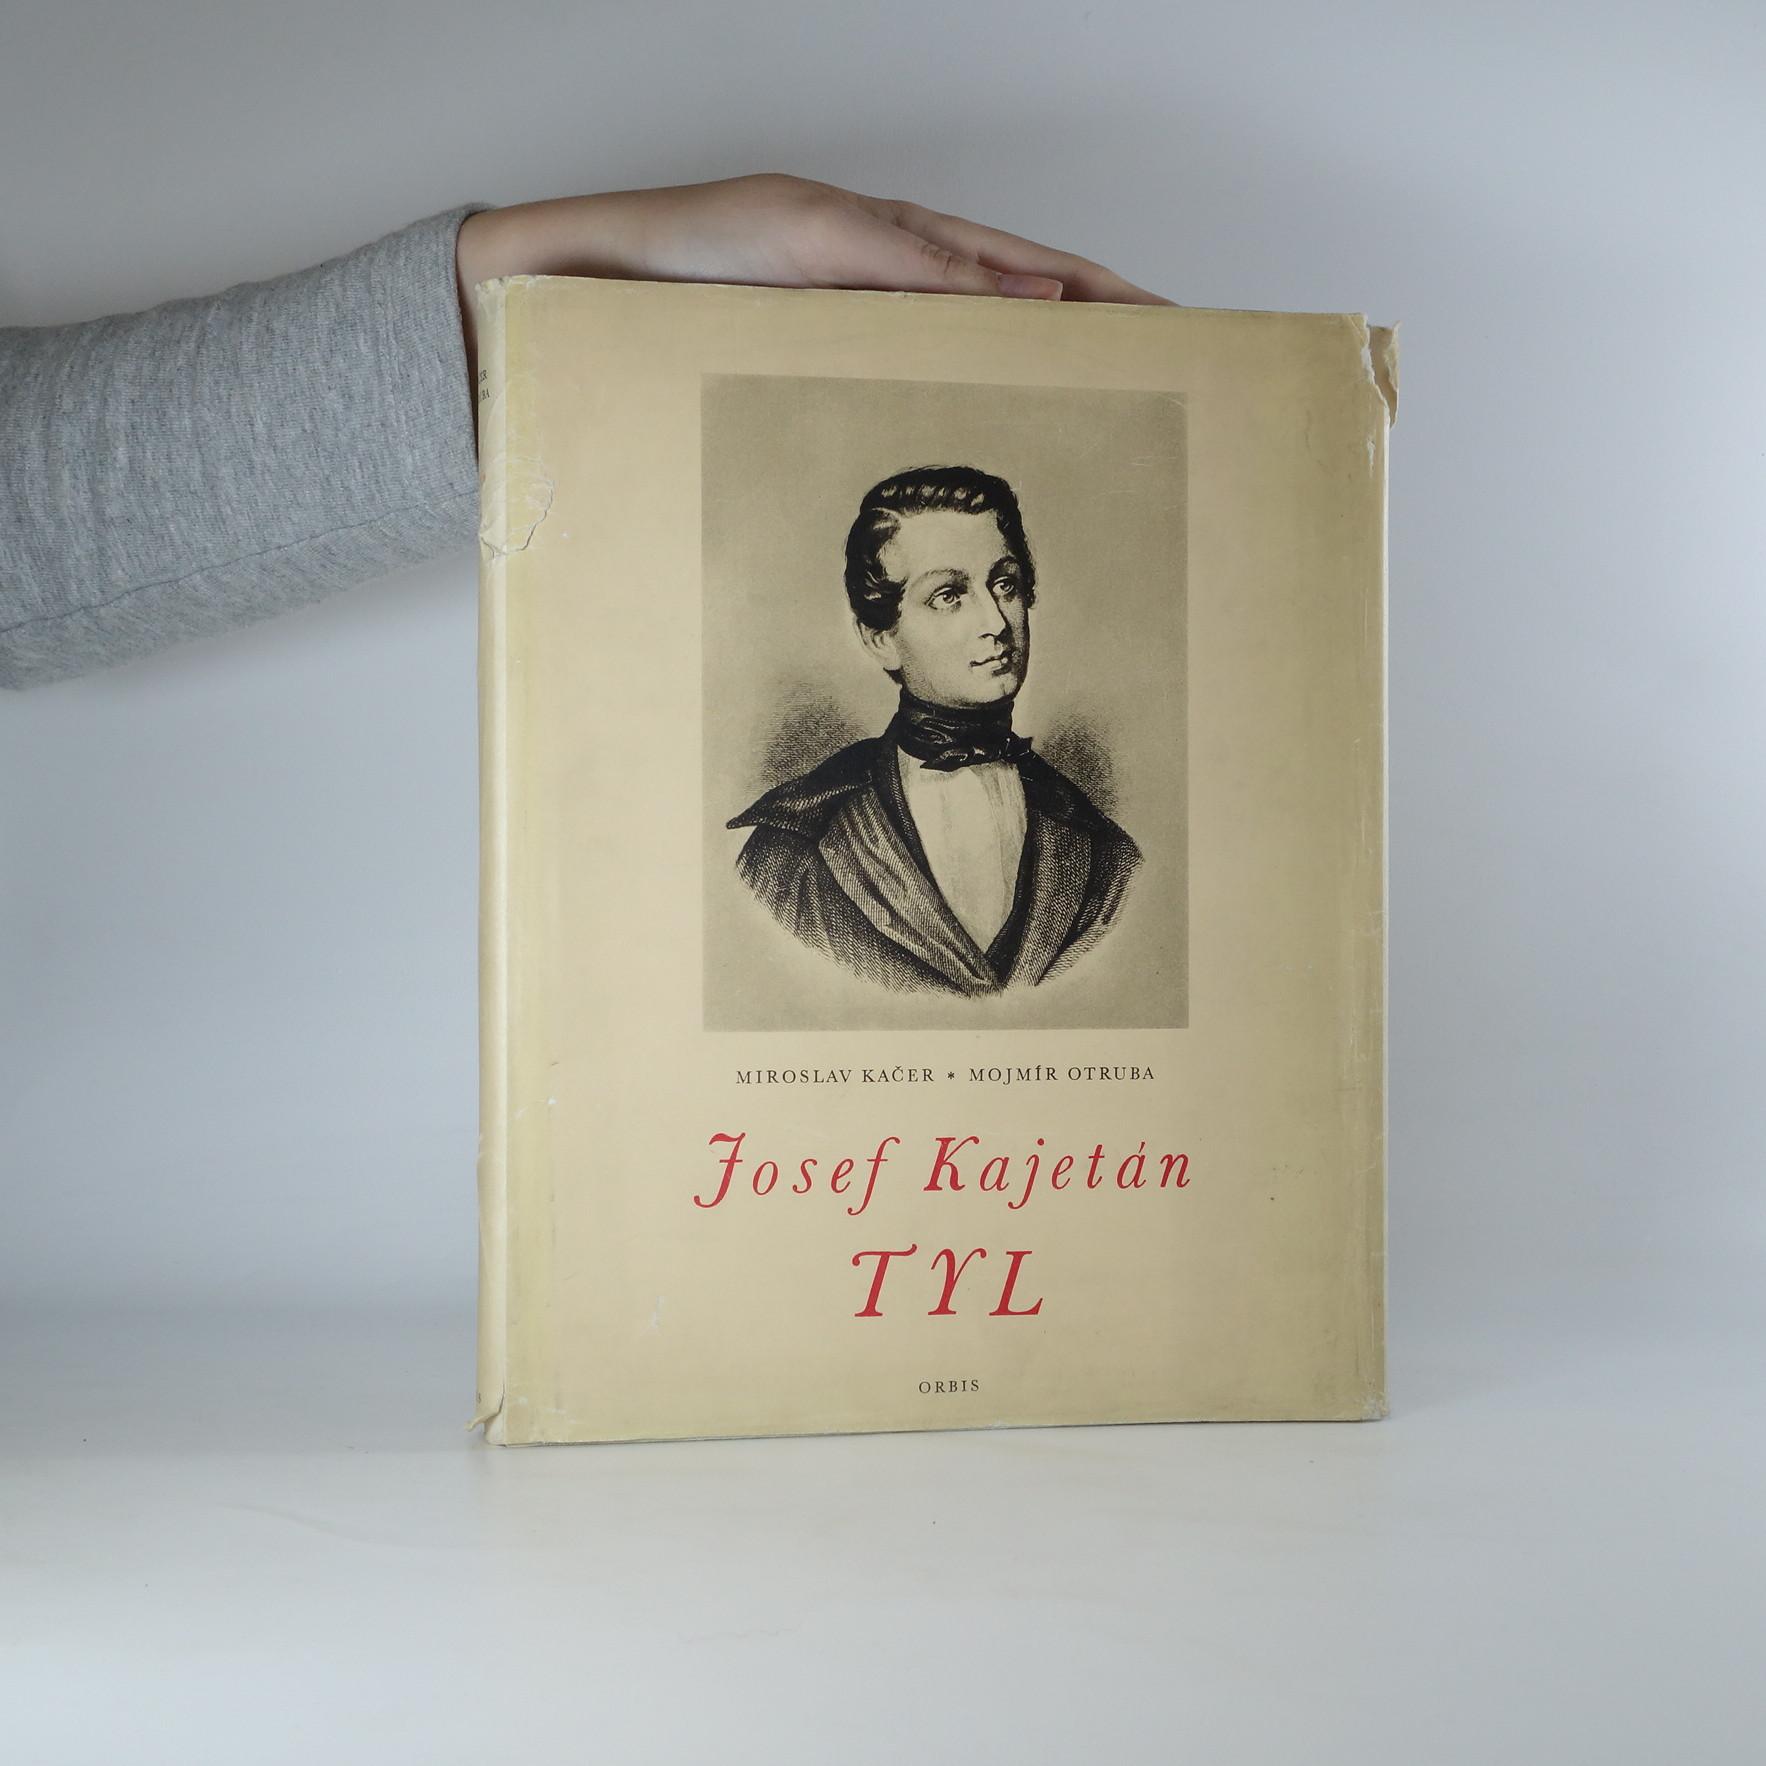 antikvární kniha Josef Kajetán Tyl, 1959